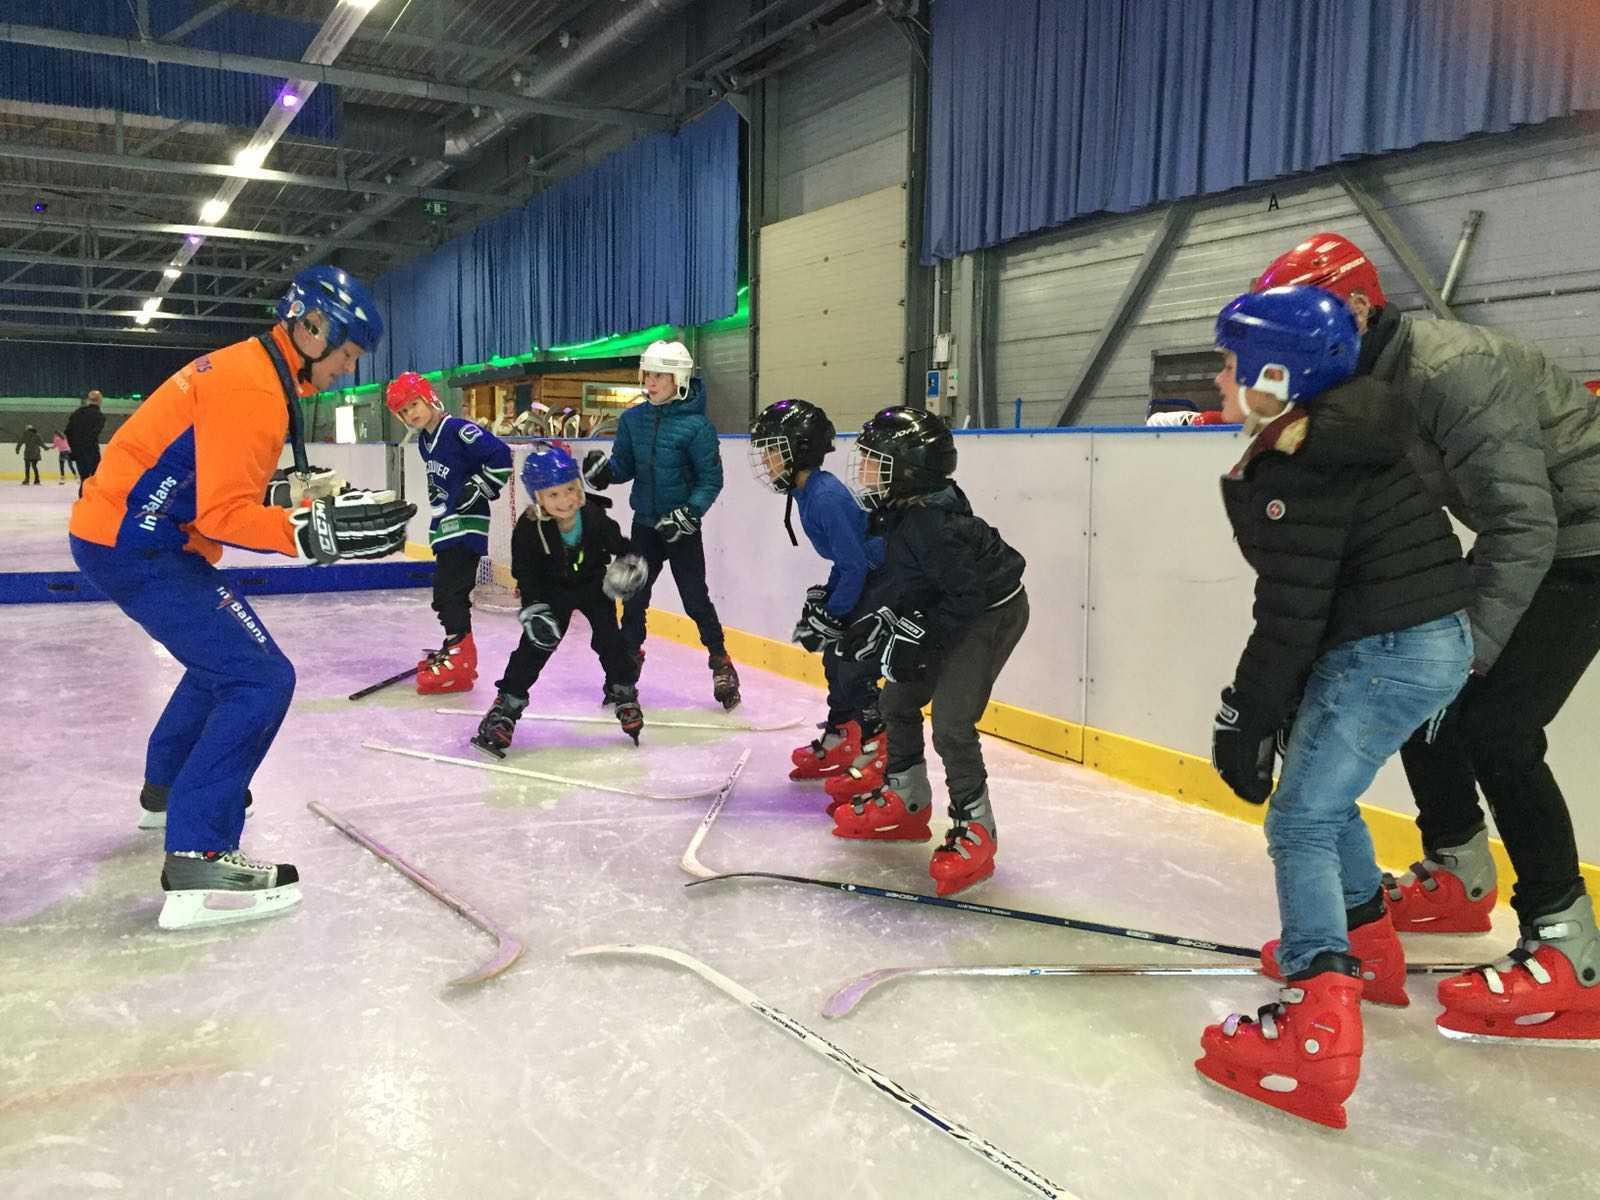 IJshockeyen met inbalansalkmaar